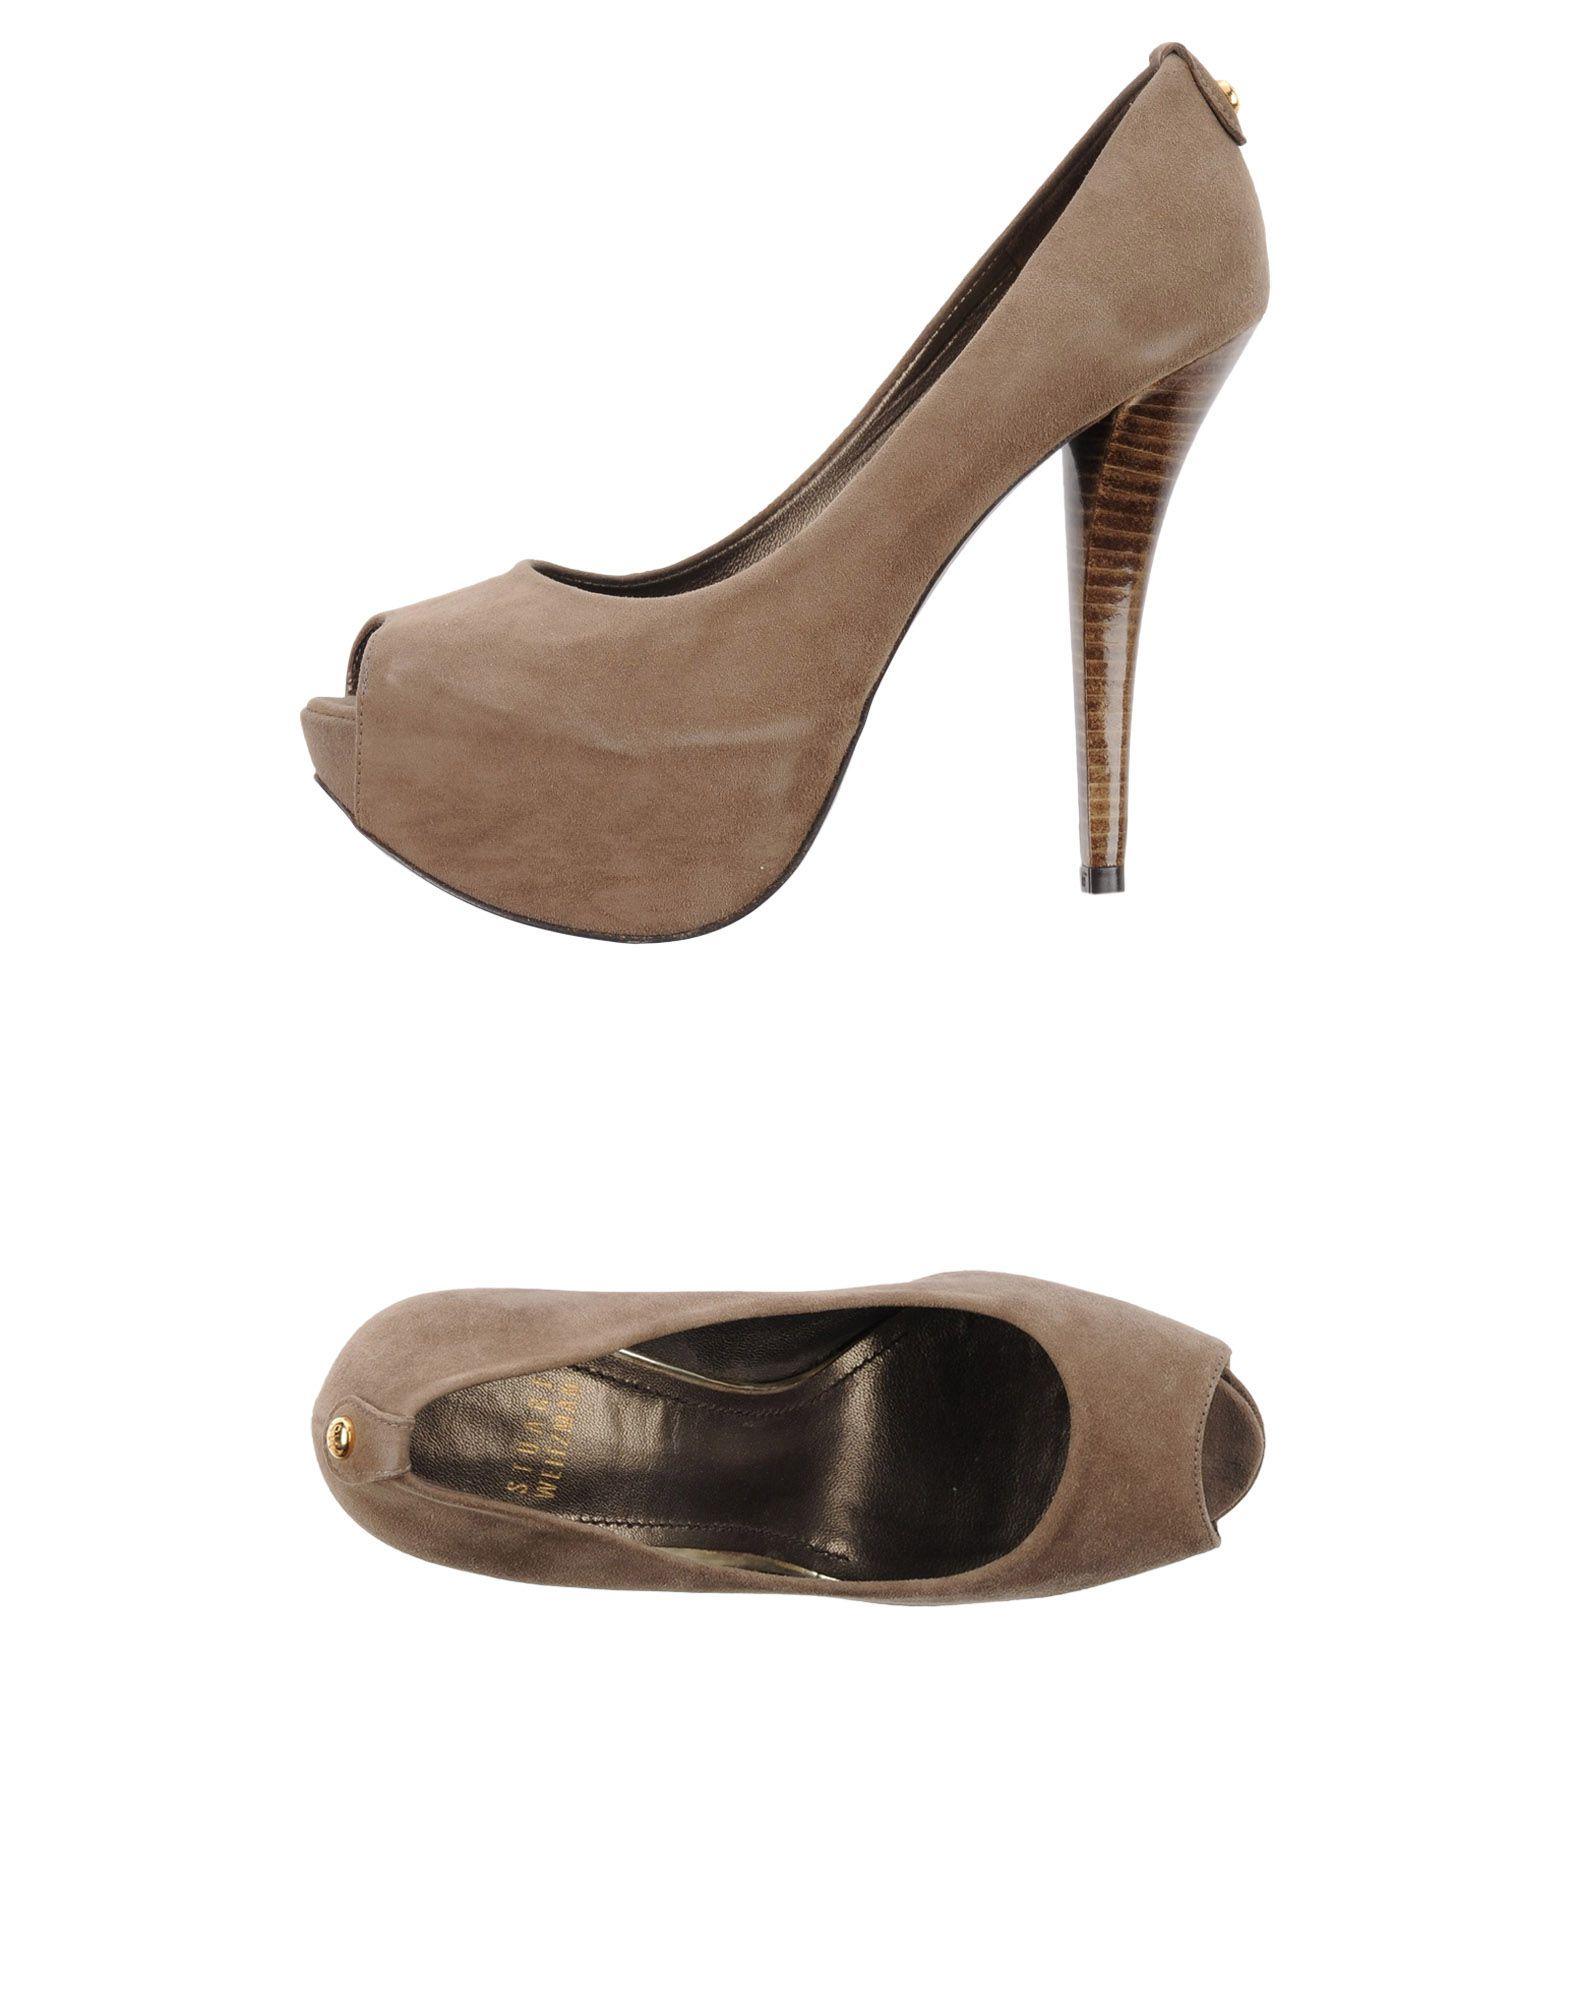 STUART WEITZMAN Туфли туфли stuart weitzman туфли на среднем каблуке